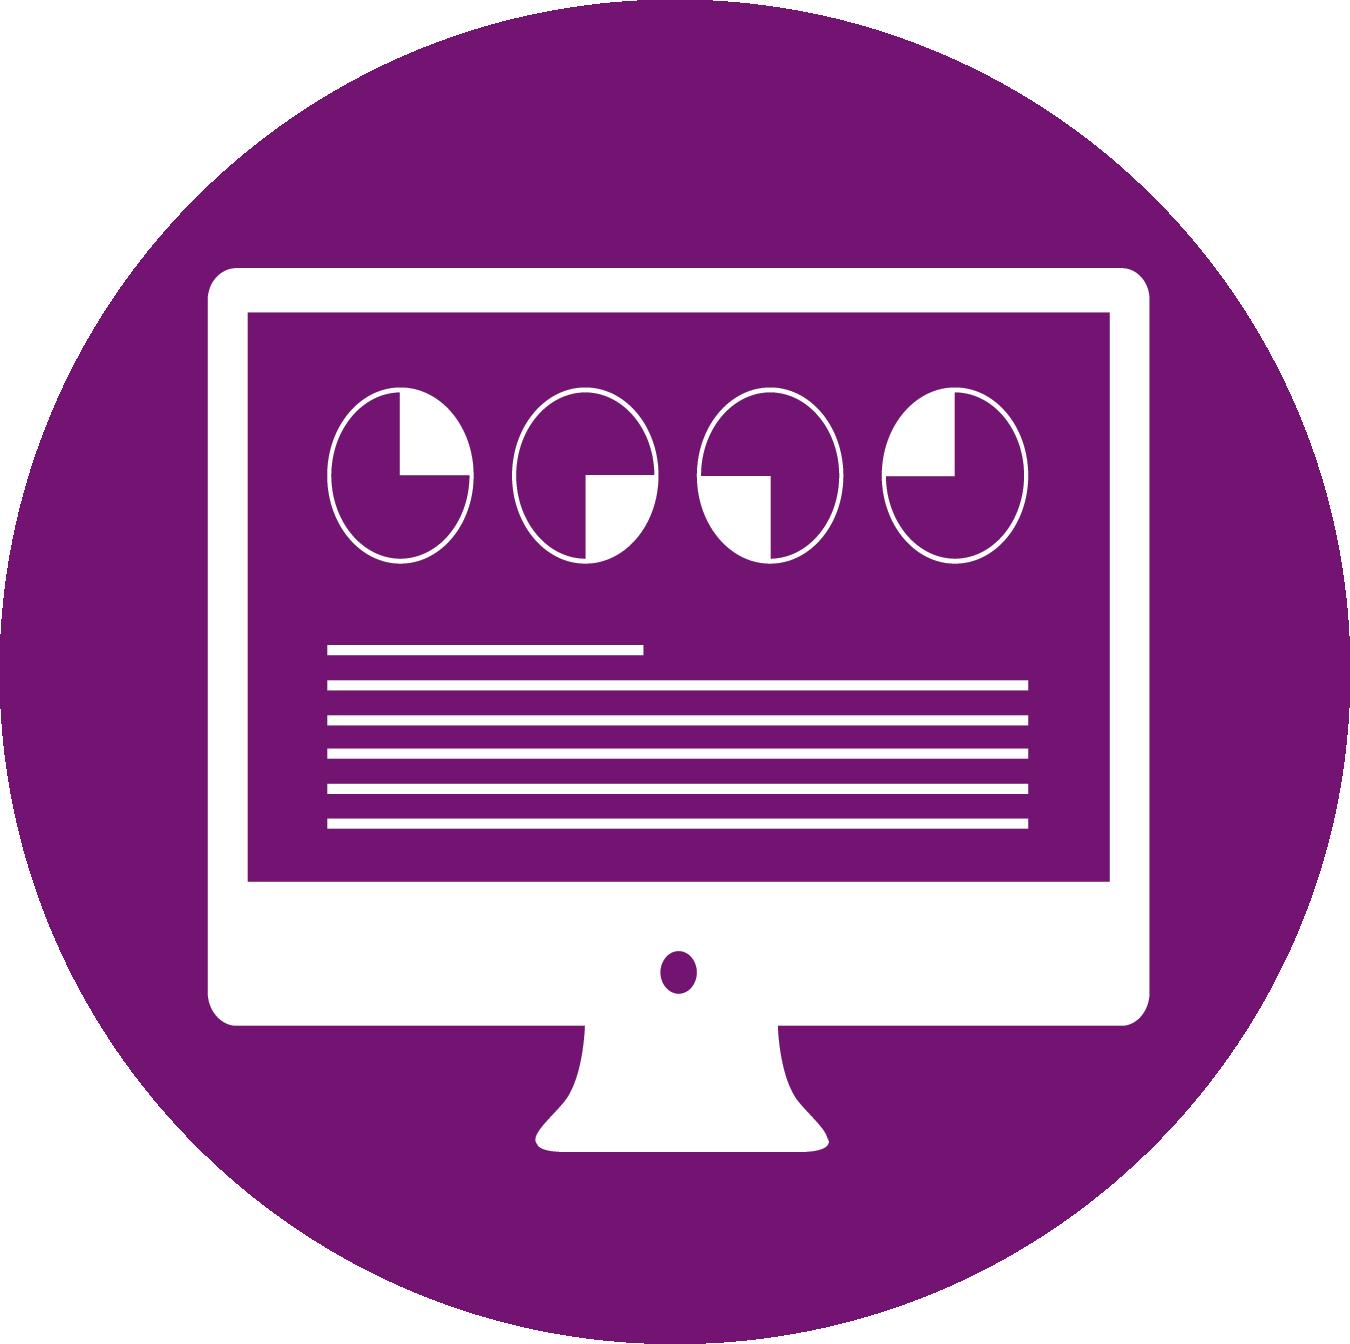 Evaluation clipart evaluation sheet. Quality element outcomes ga